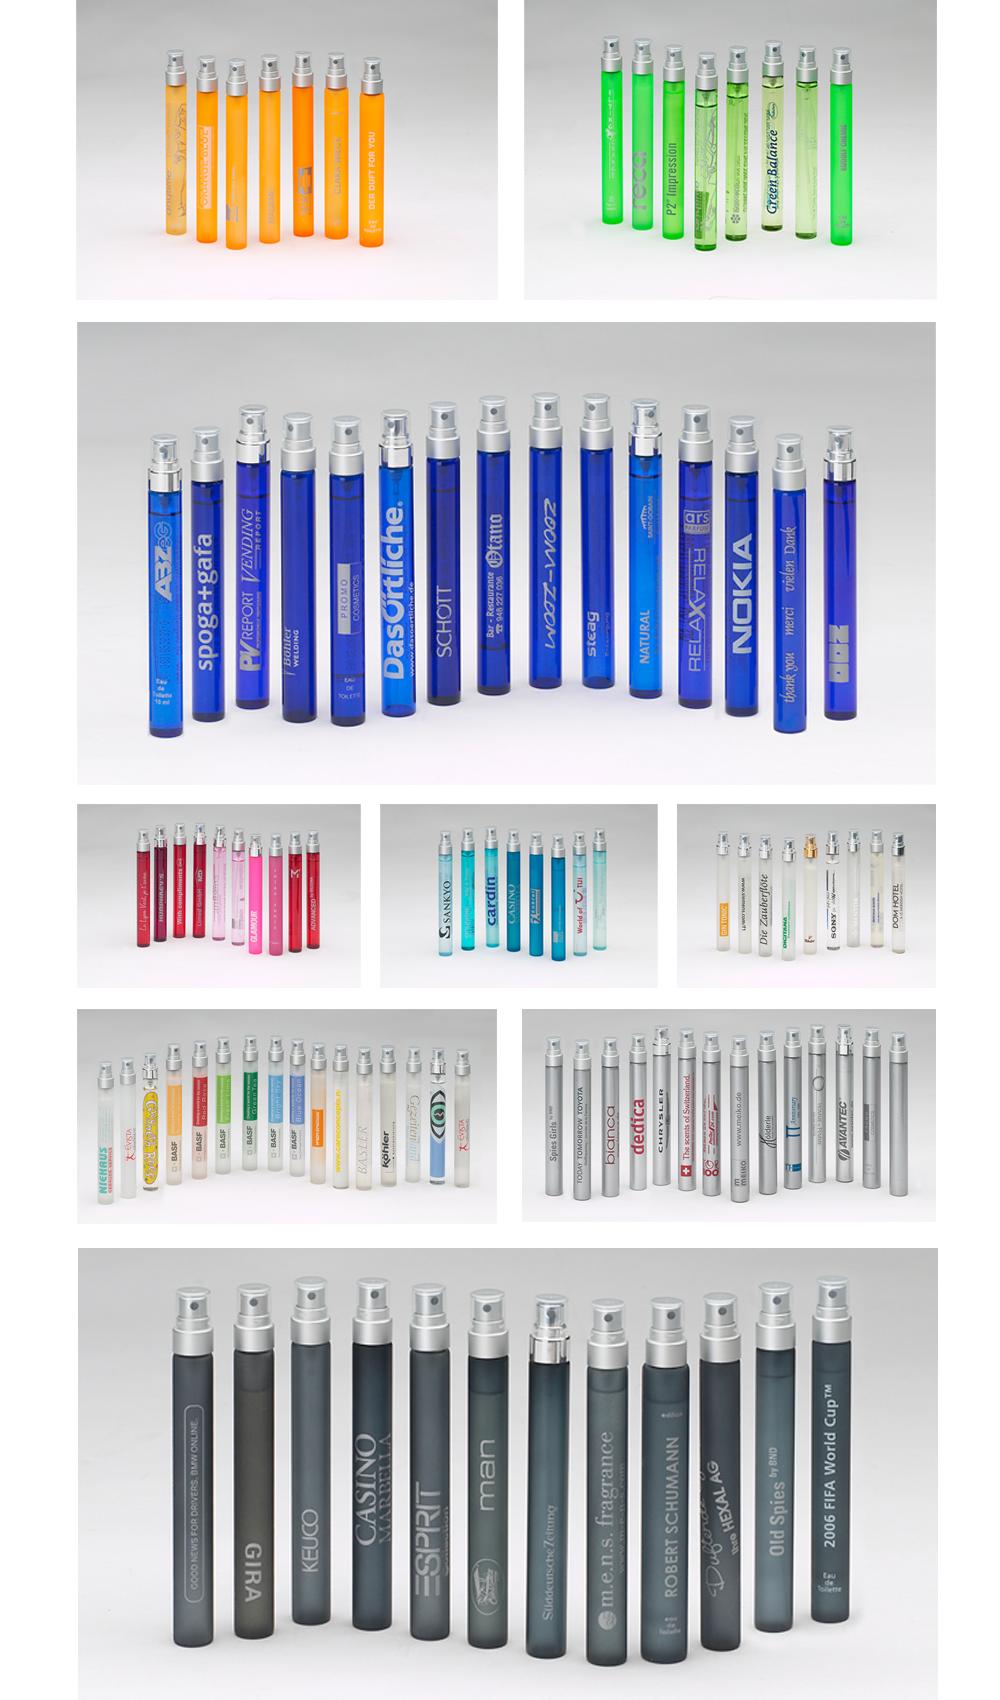 Werbemittel – Pocket spray